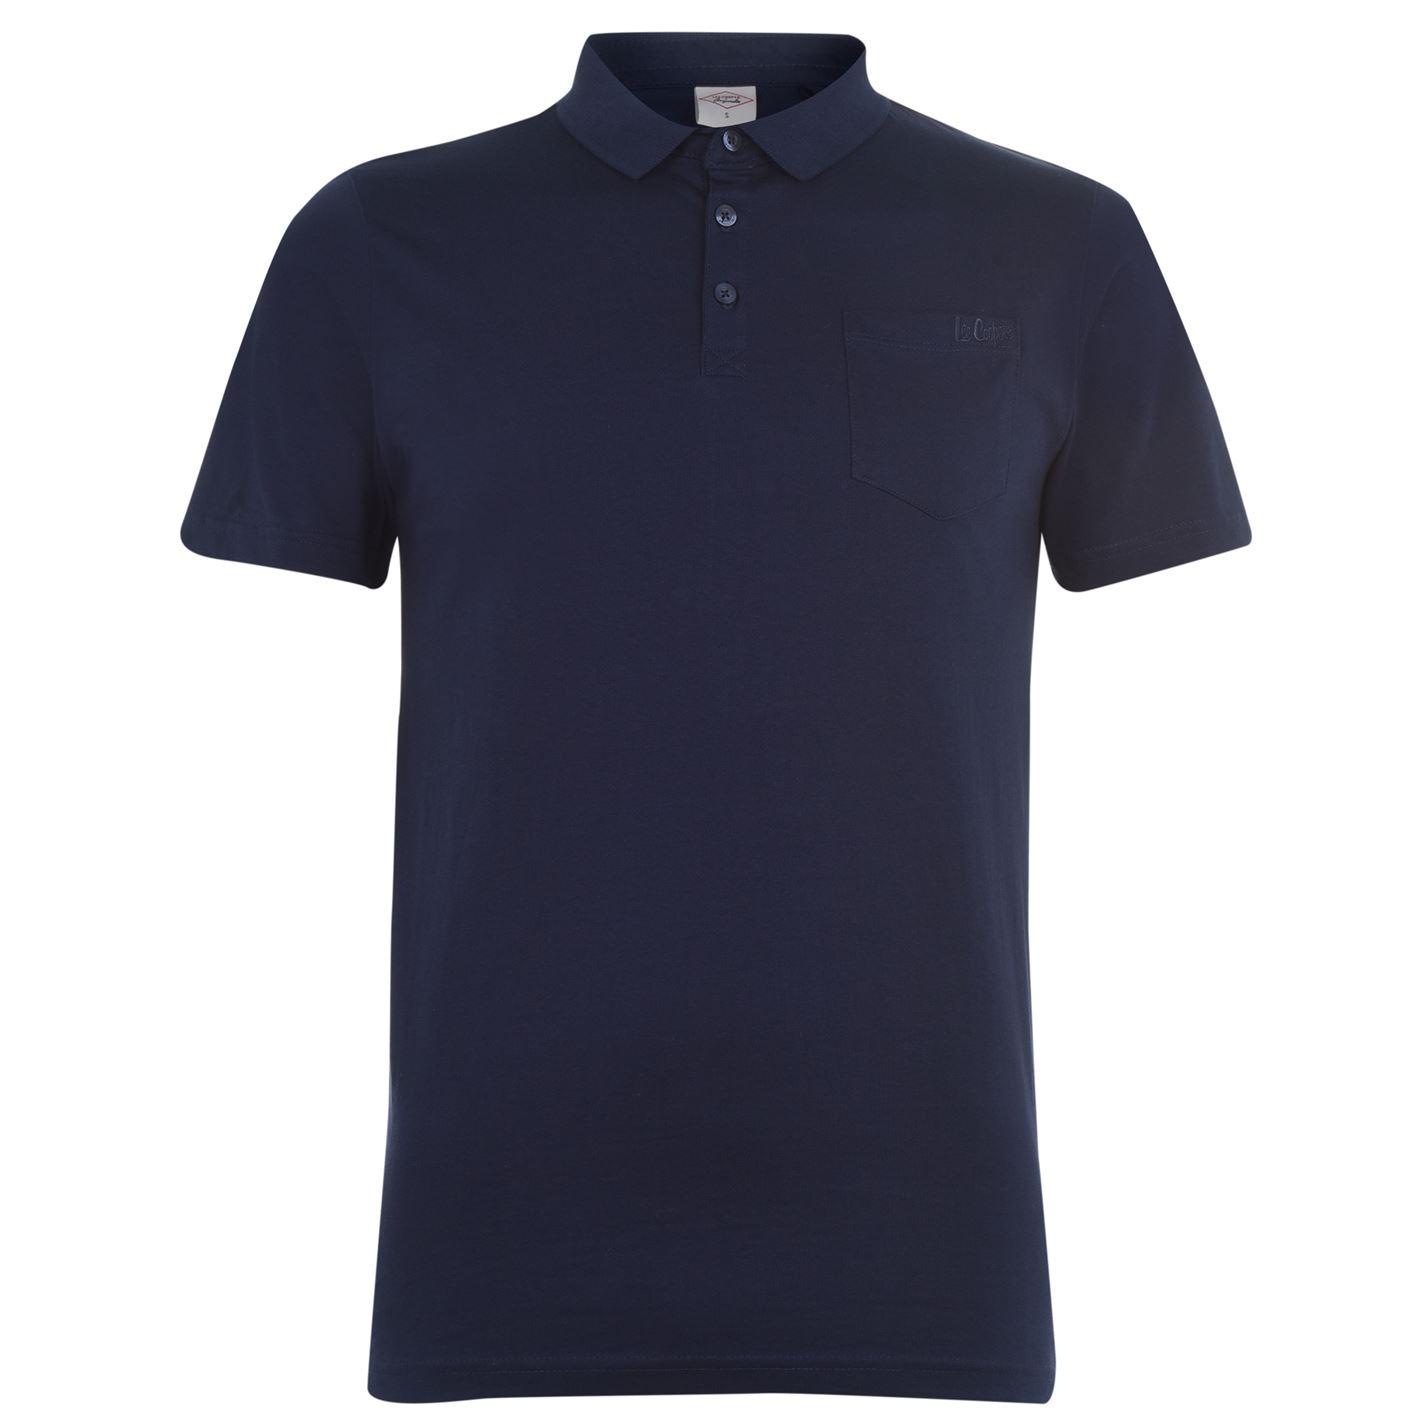 Lee Cooper Essentials Polo Shirt Mens